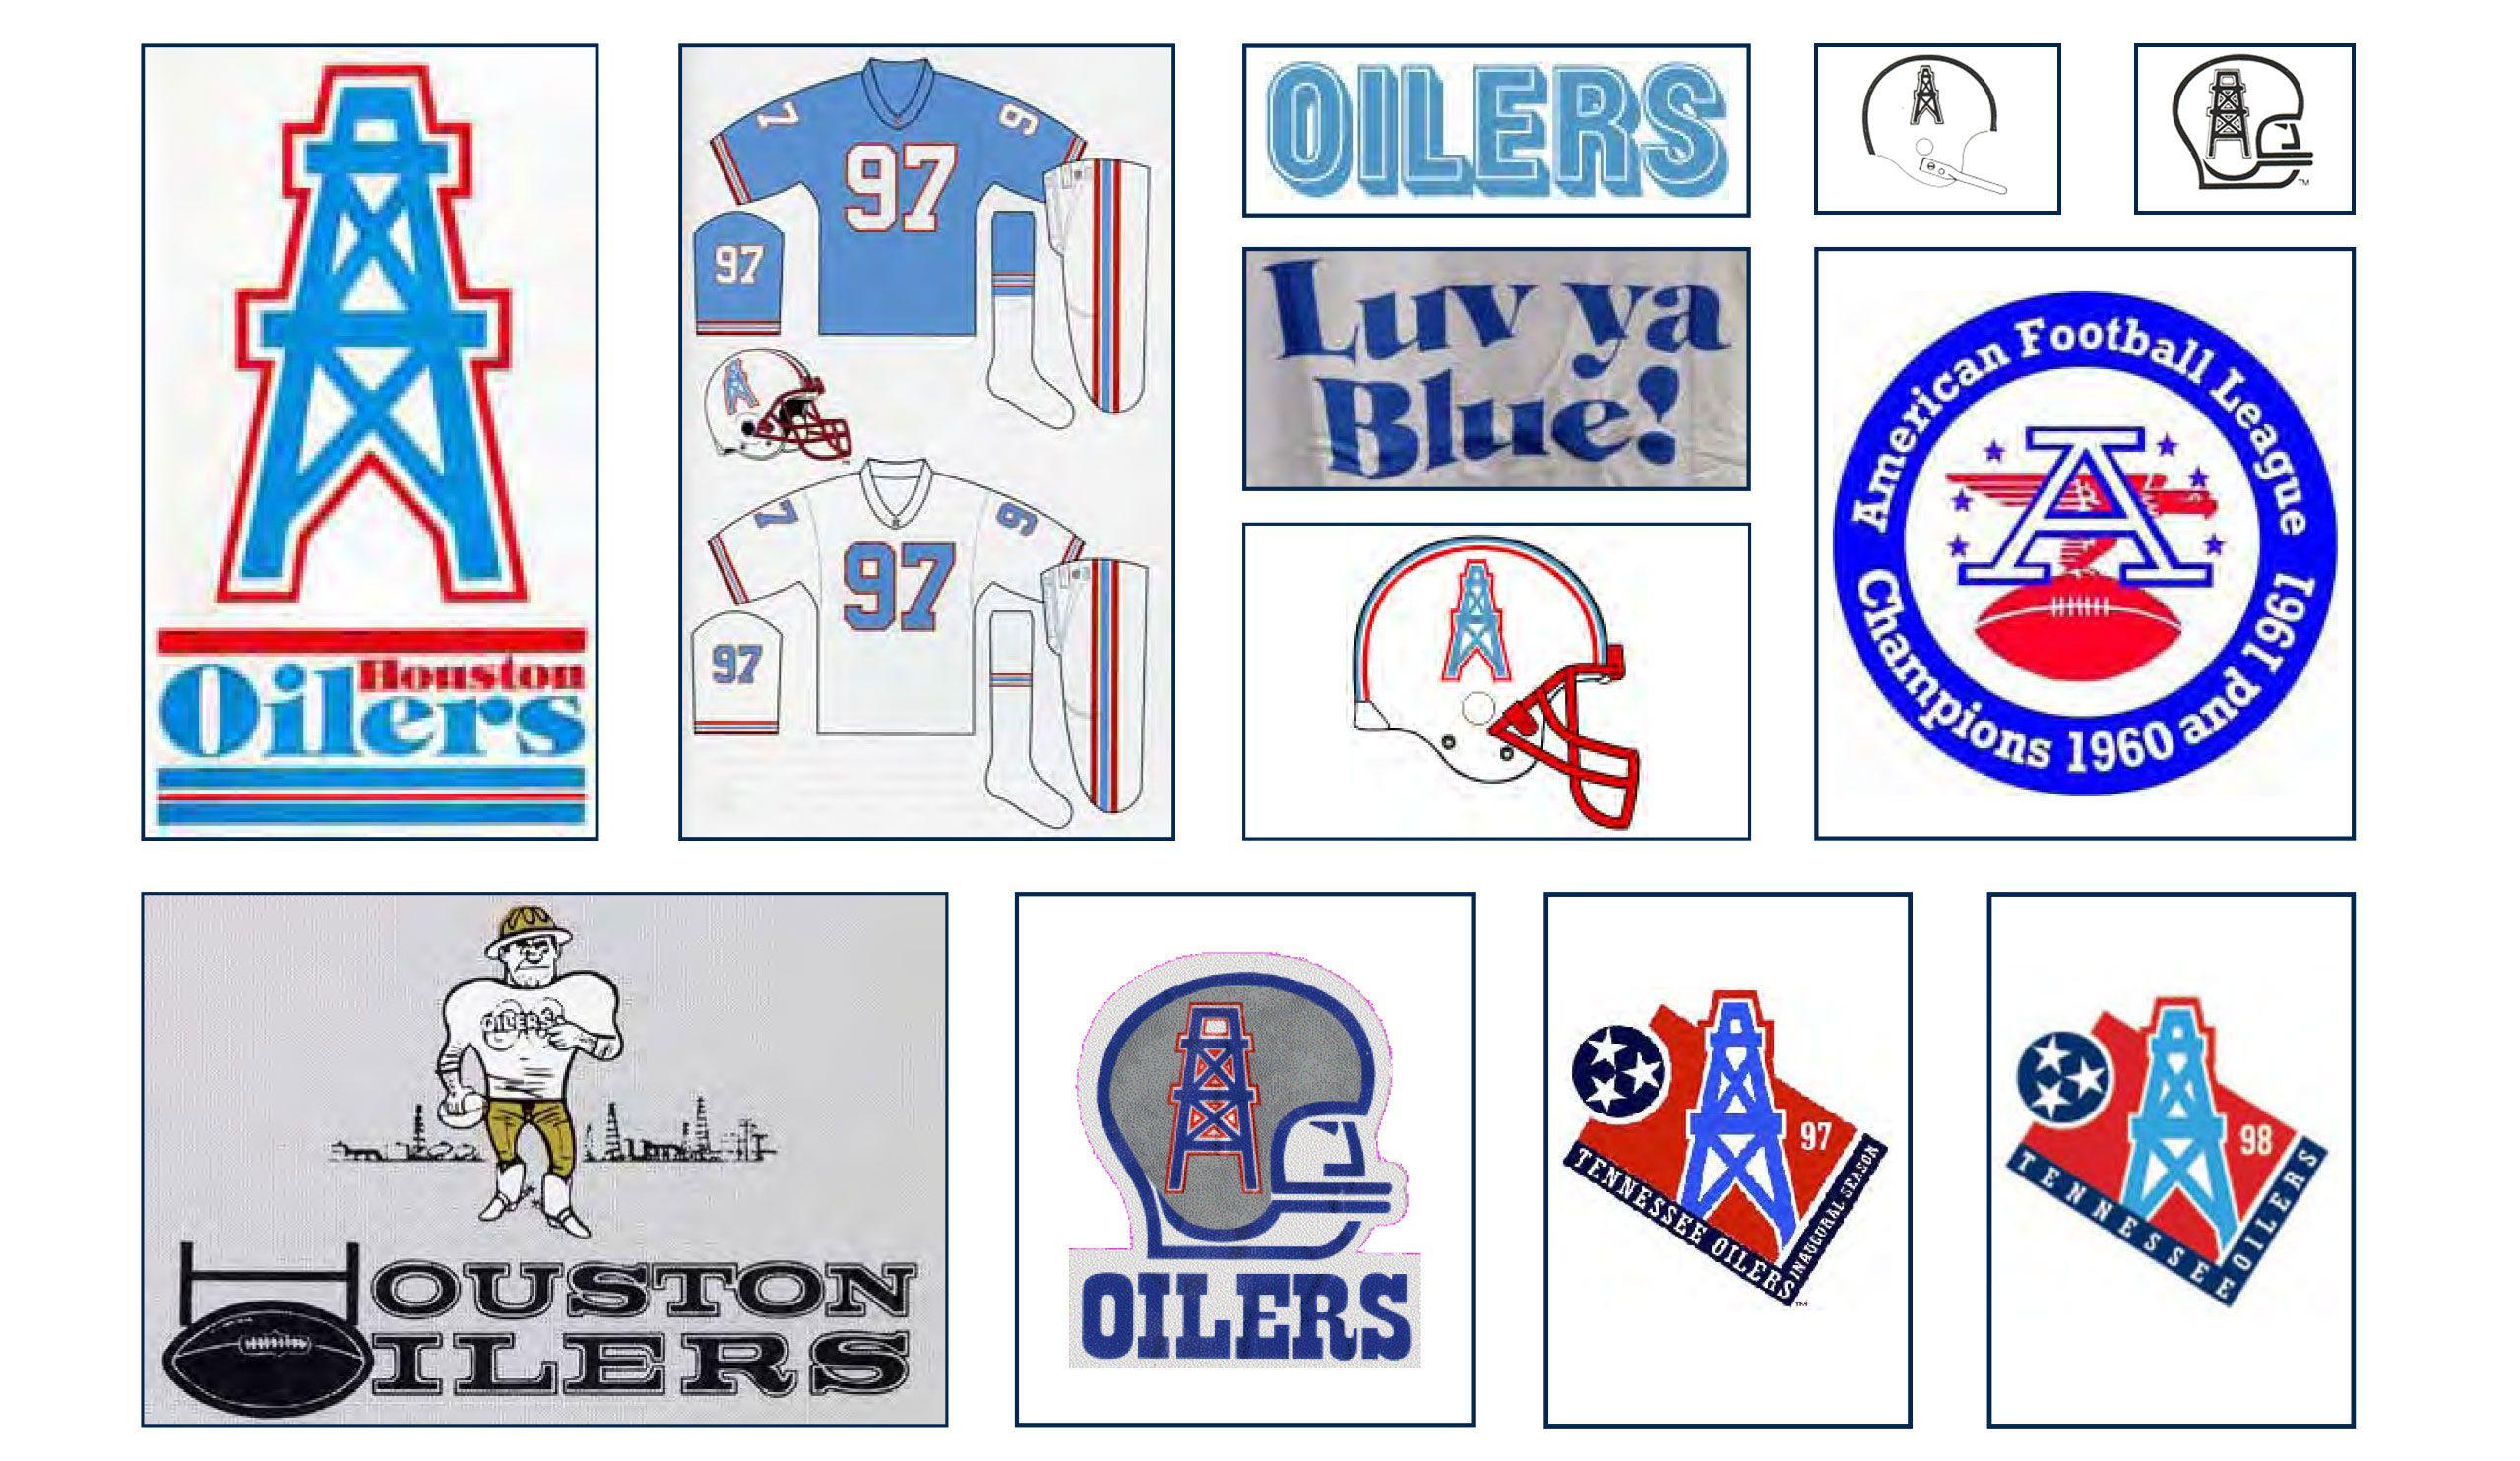 oilers-logo-history-2560